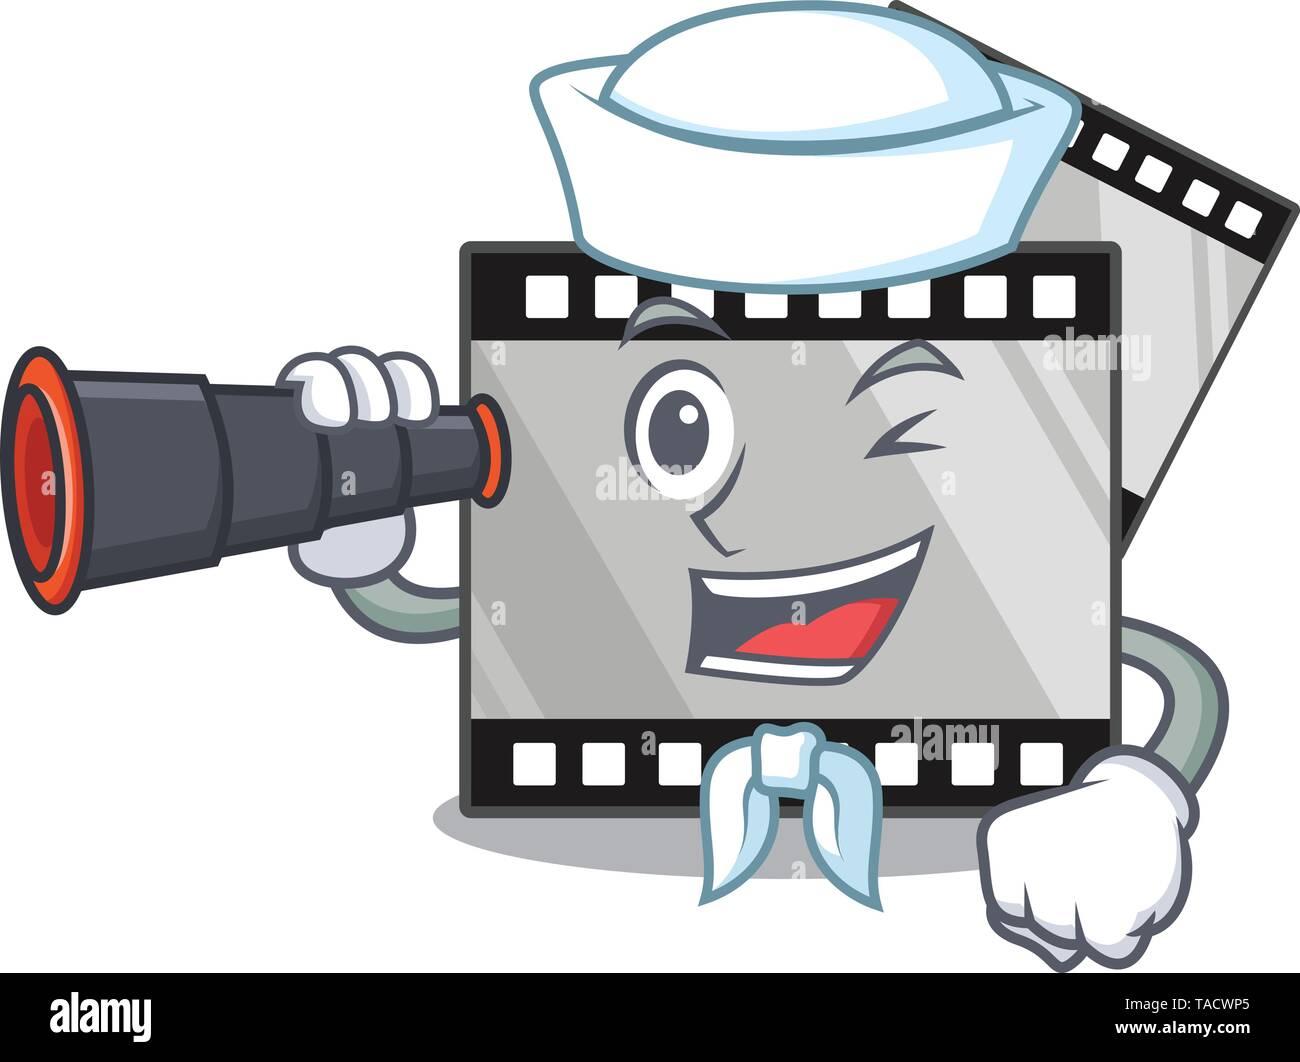 Sailor with binocular stripe movie toys in cartoon shape - Stock Image